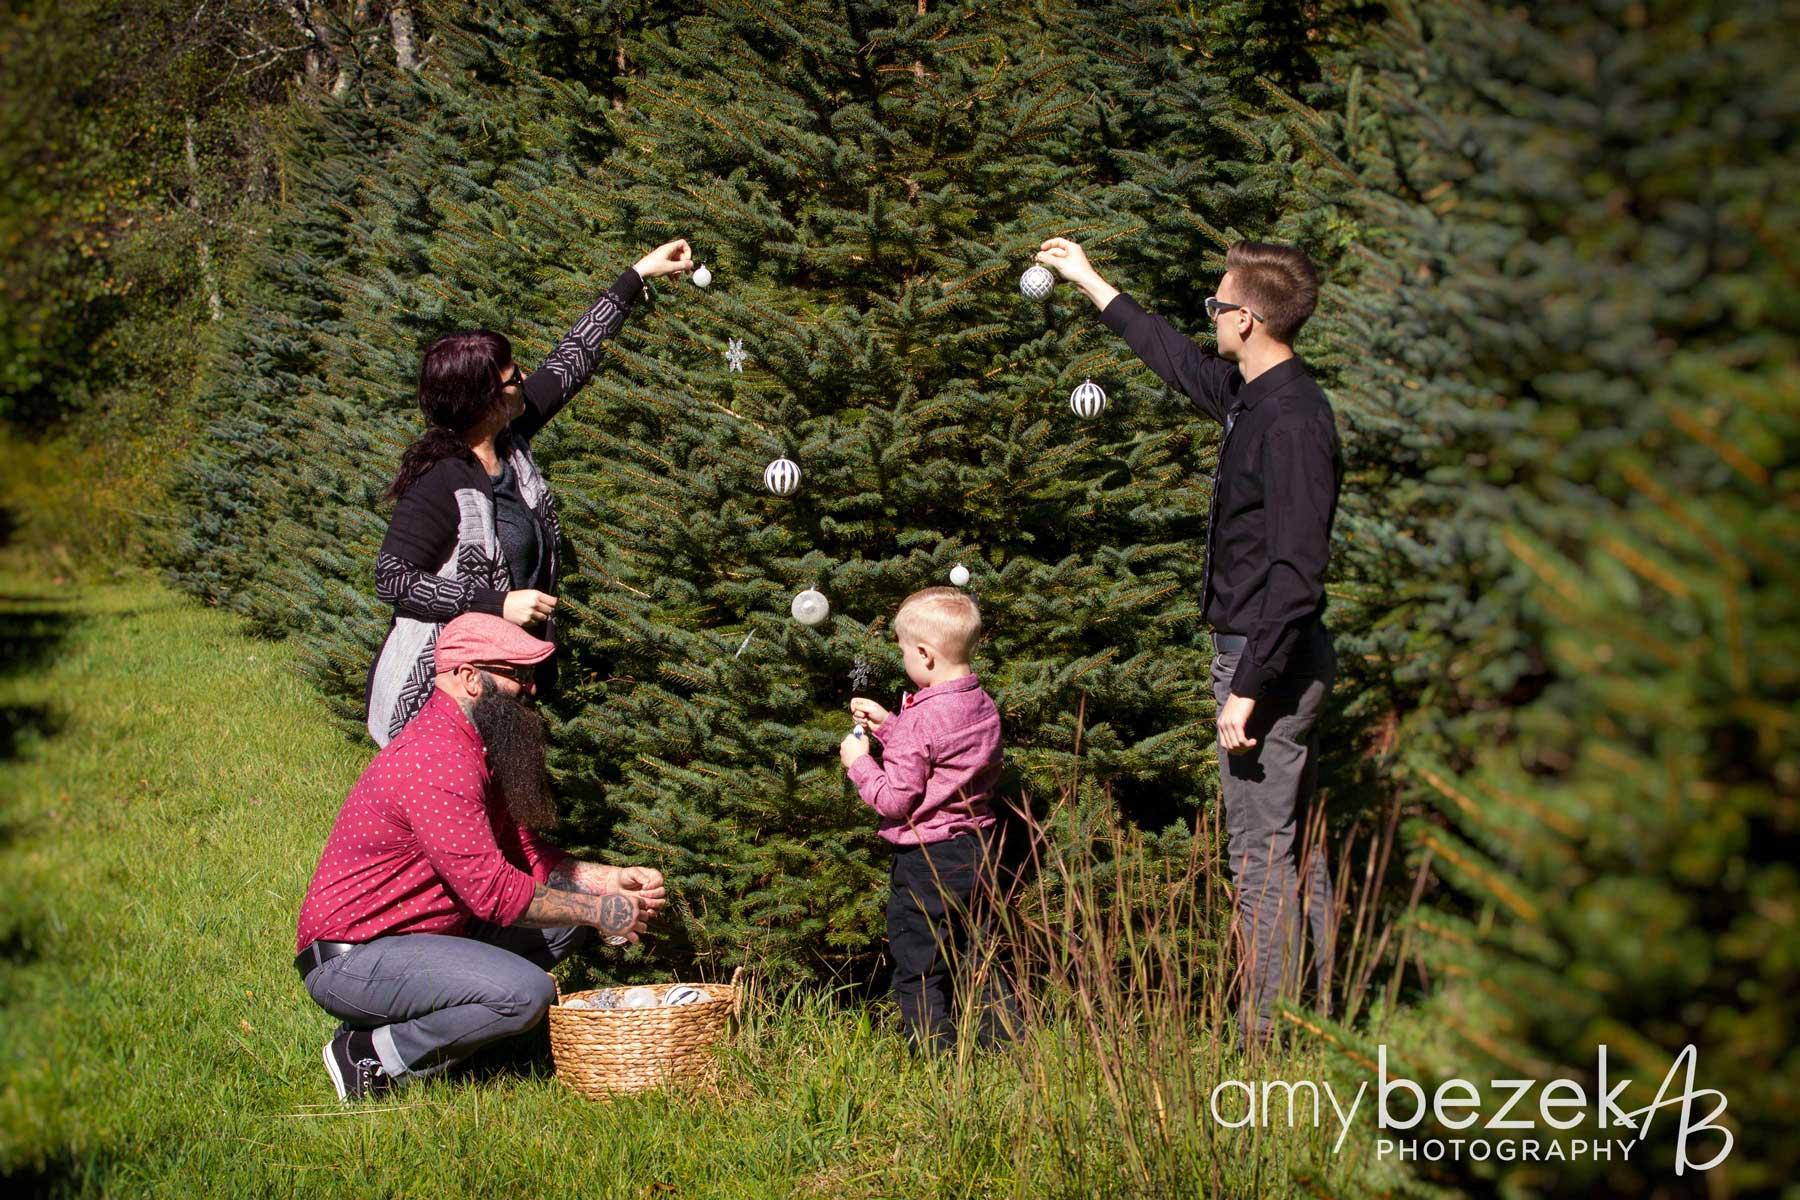 Christmas Tree Farm Photography, Wilkes-Barre, PA